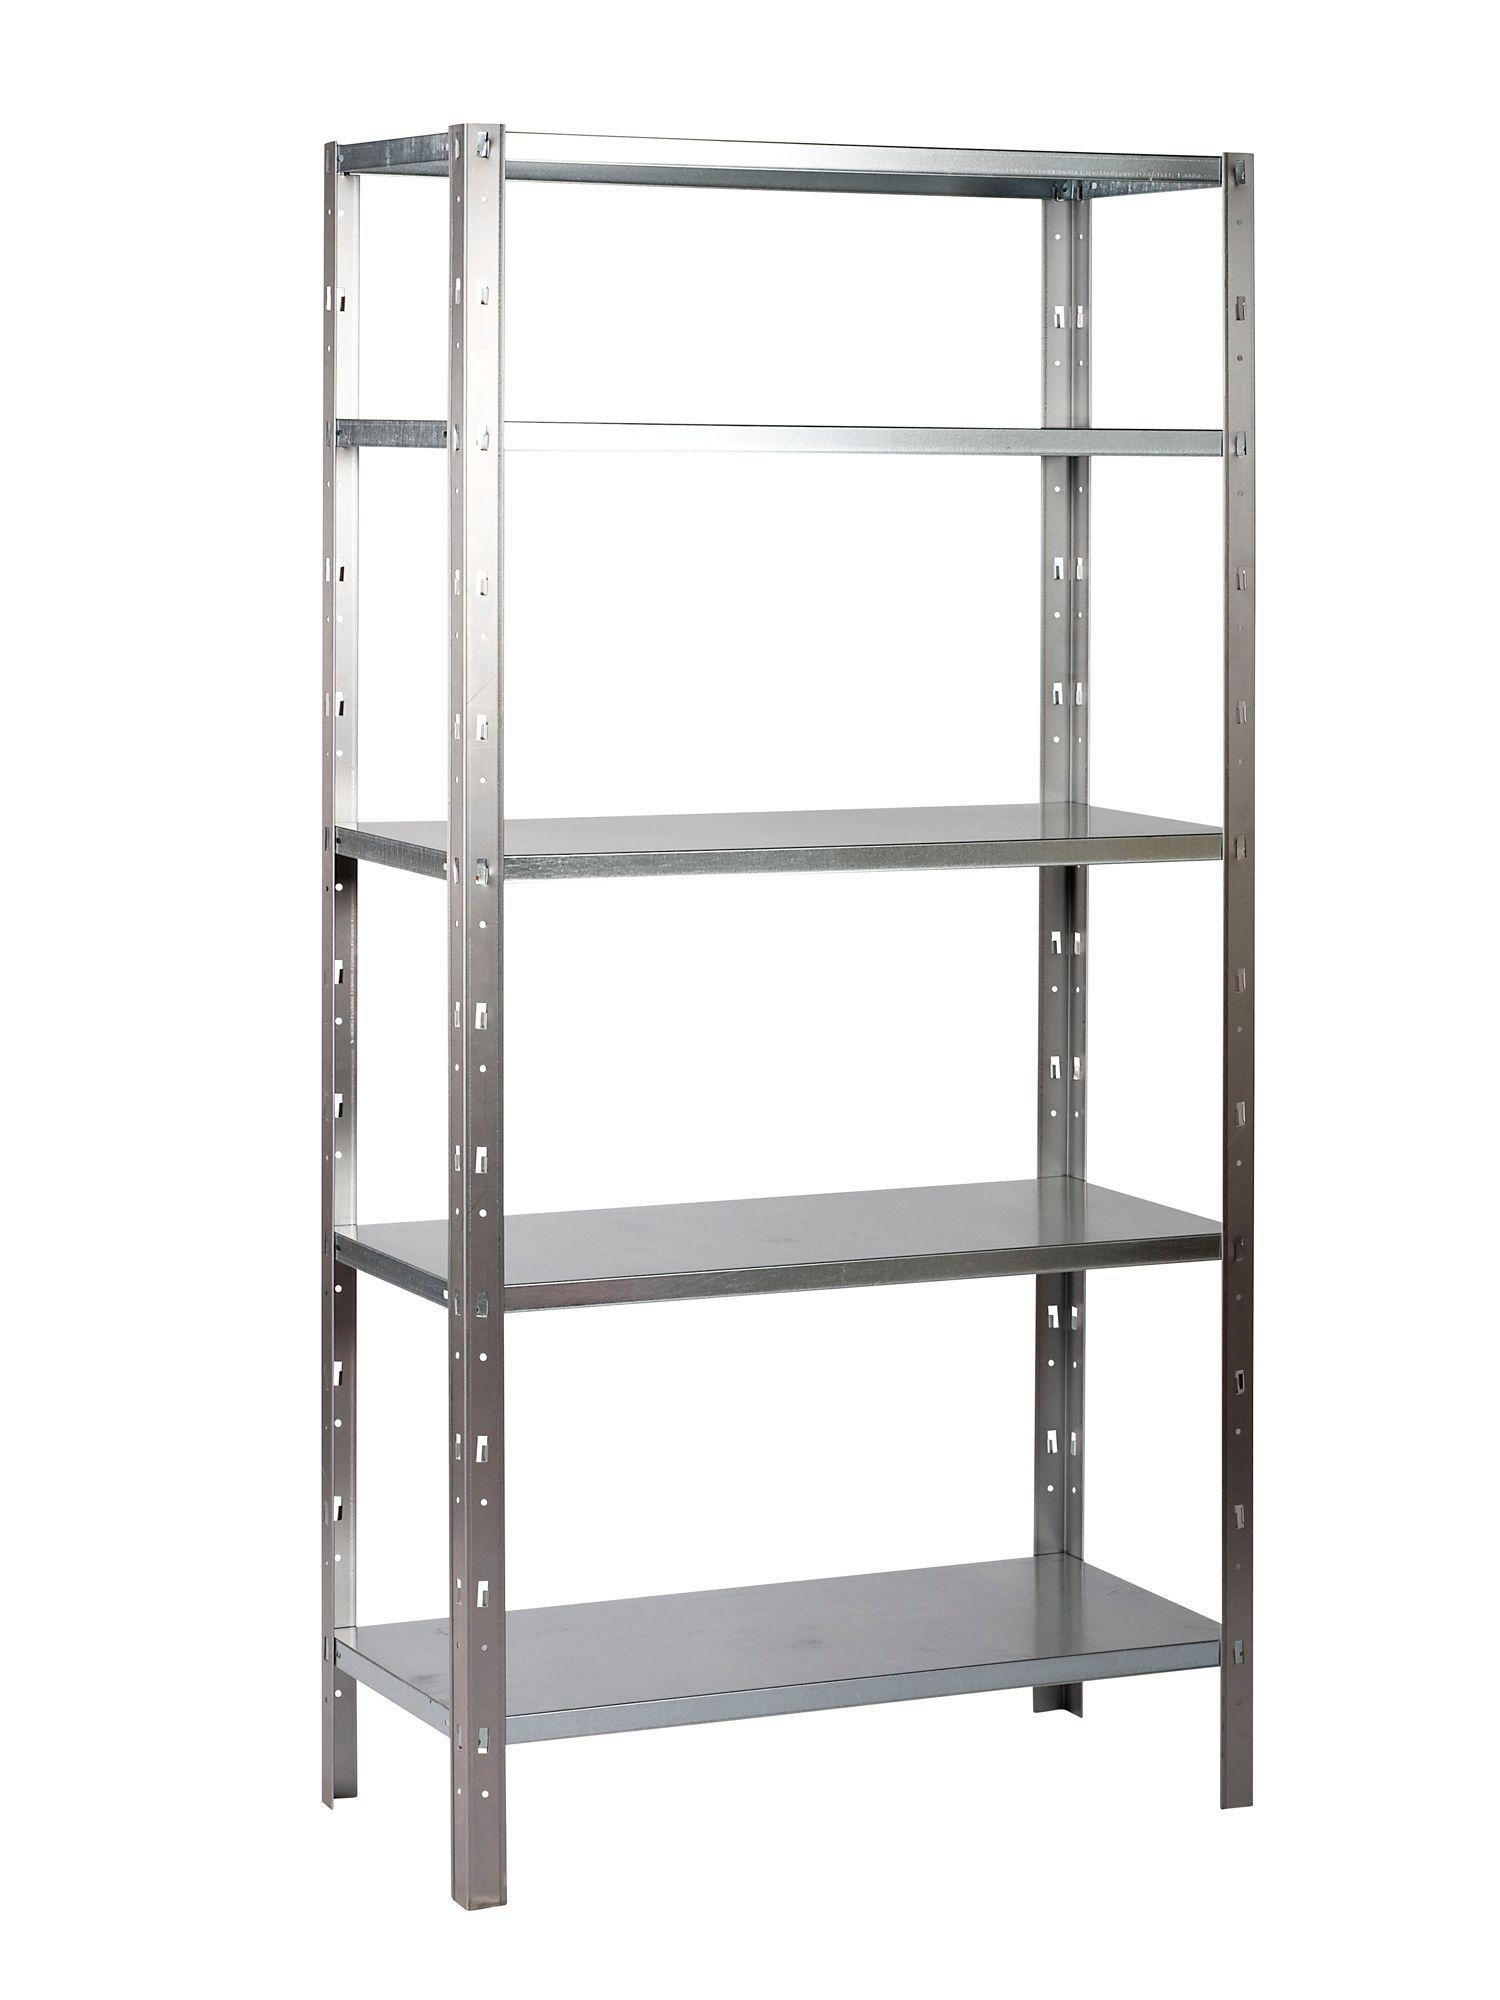 b q 5 shelf steel shelving unit departments diy at b q. Black Bedroom Furniture Sets. Home Design Ideas